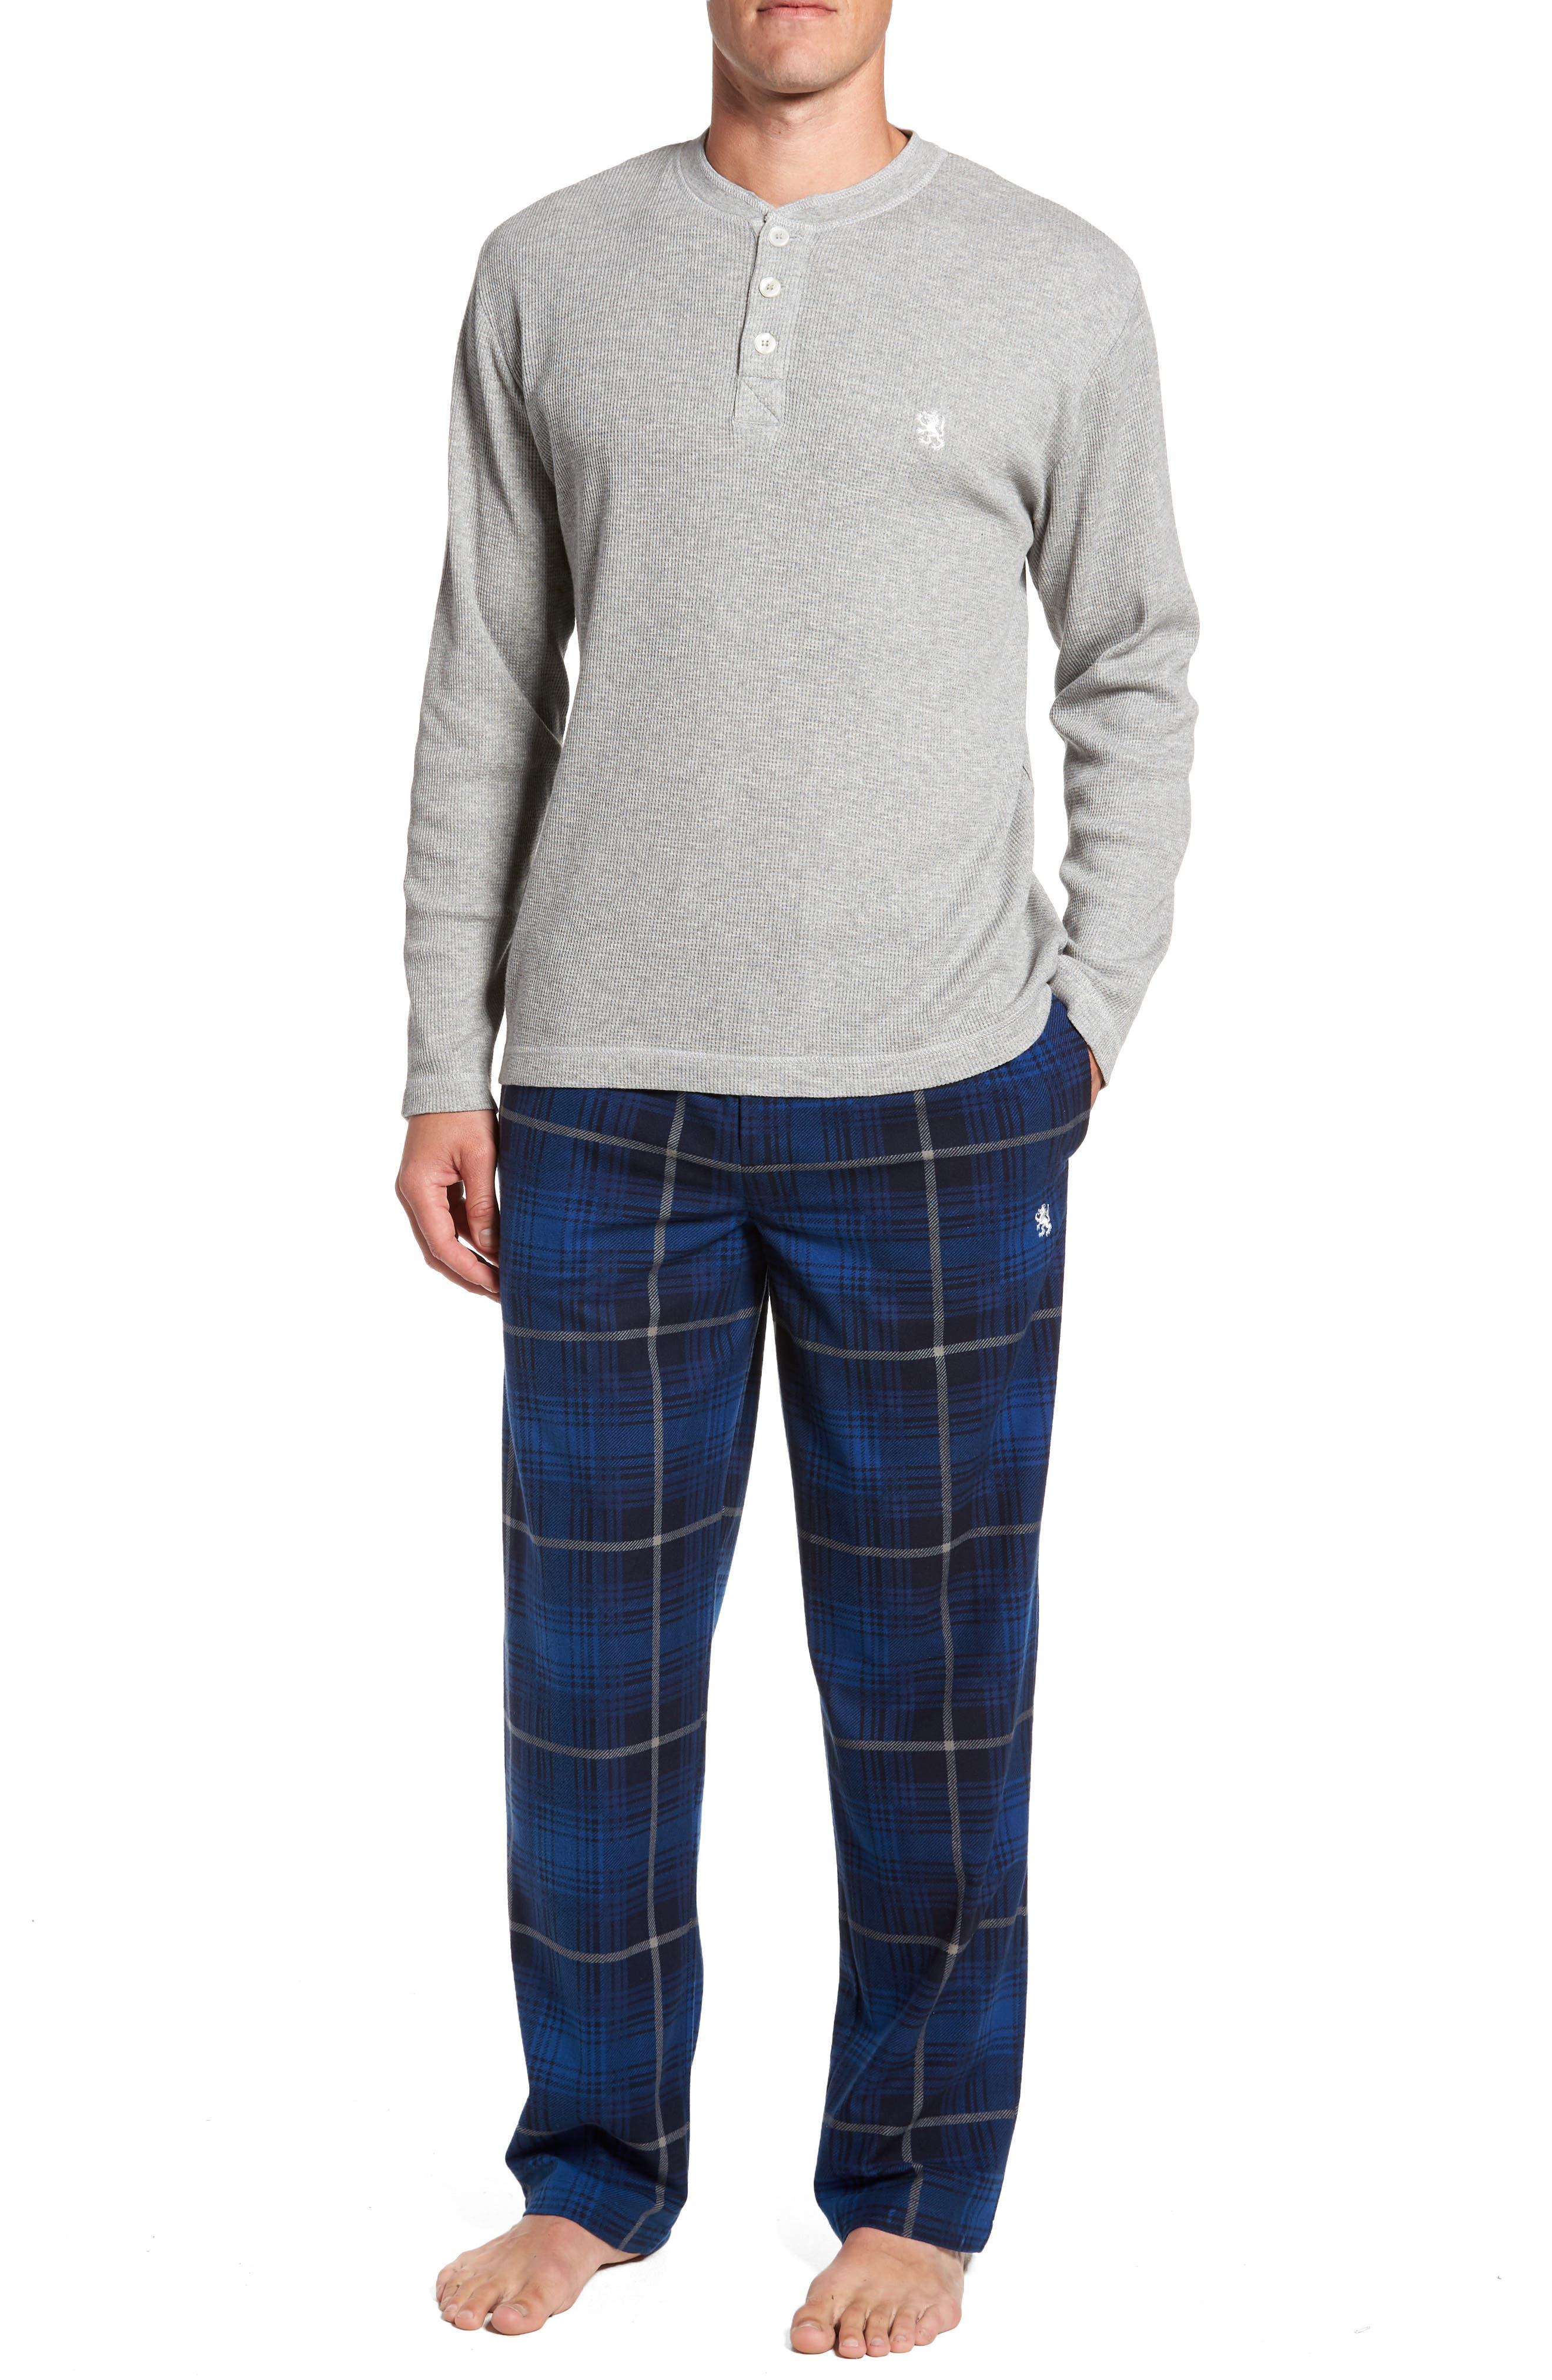 Alternate Image 1 Selected - Majestic International Nifty Gift Henley Shirt & Lounge Pants